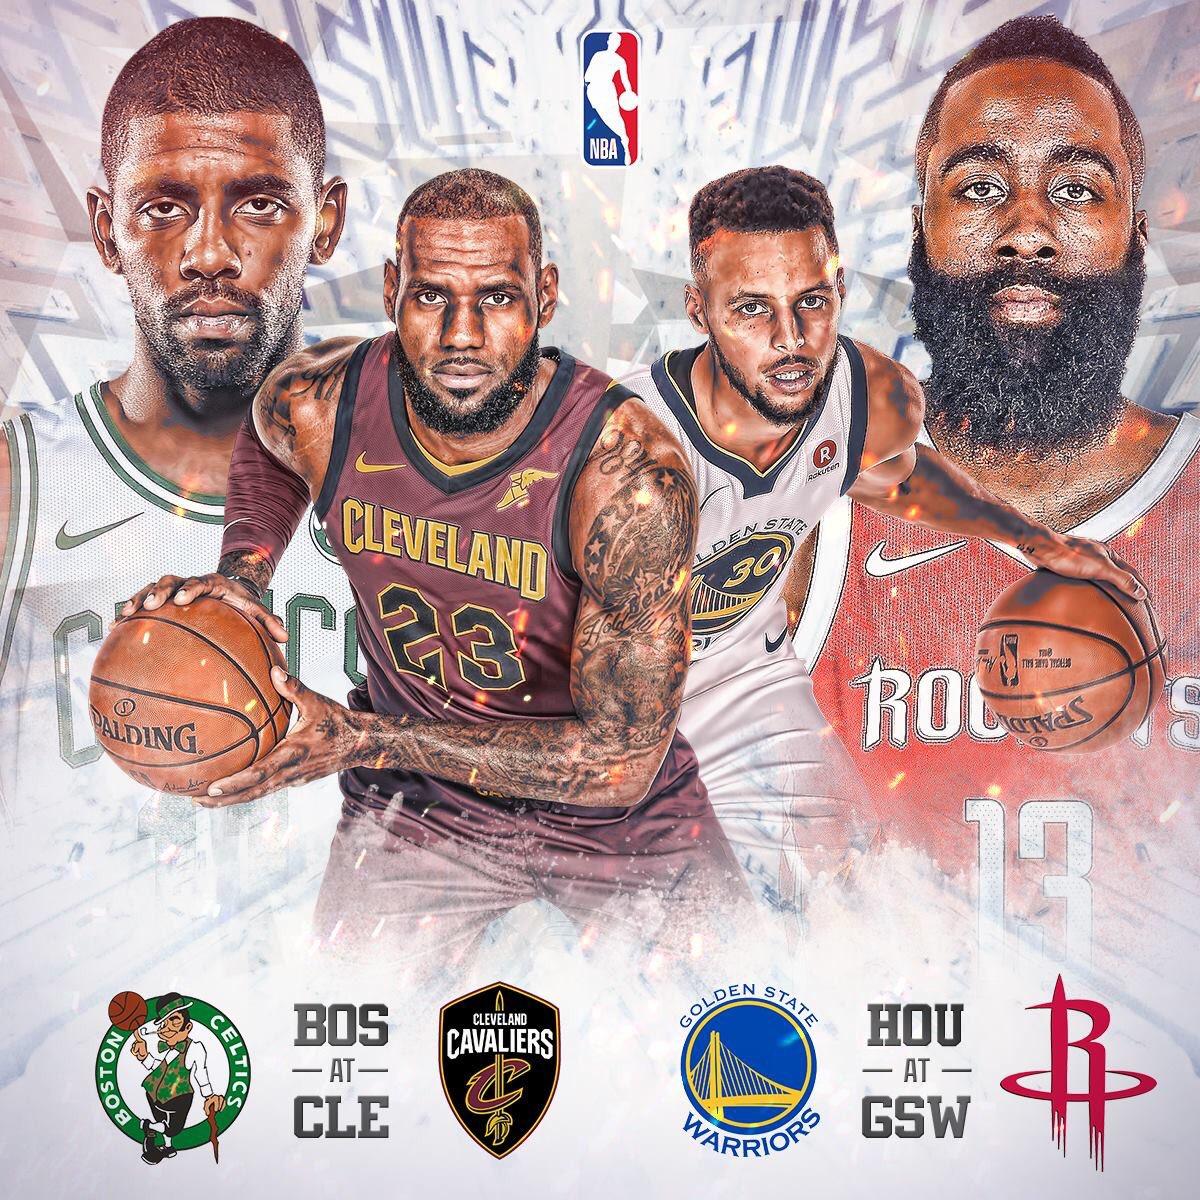 Happy NBA day #NBAisBack #Warriors #Celtics #Rockets  #Cleveland @NBA @FiddyKayNBA @NBL https://t.co/JoEEQBlSHd